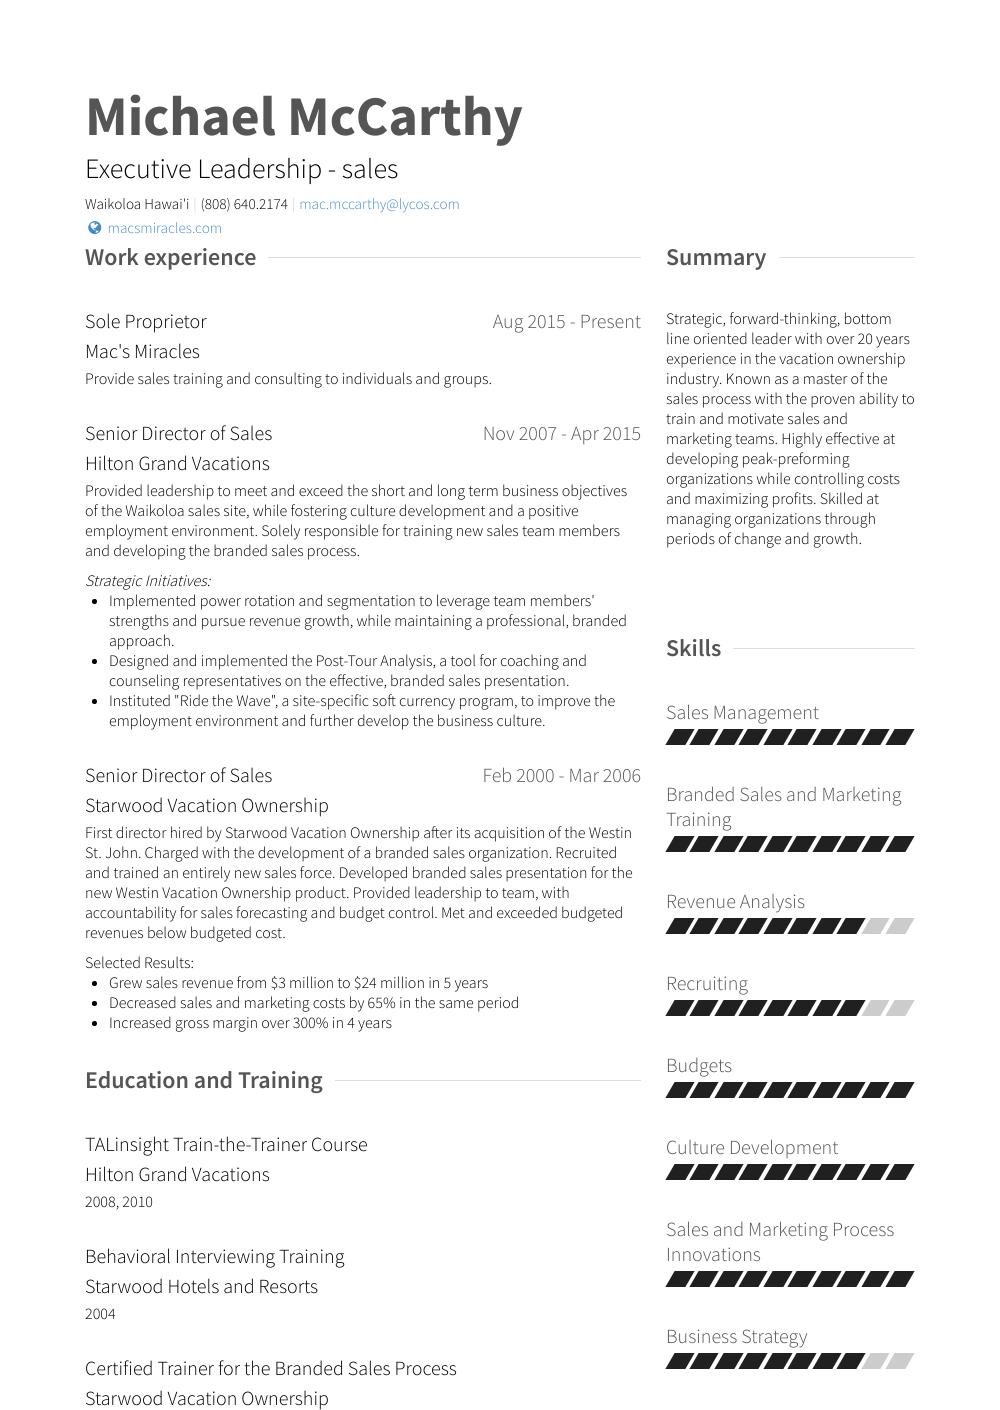 Sole Proprietor Resume Samples & Templates VisualCV